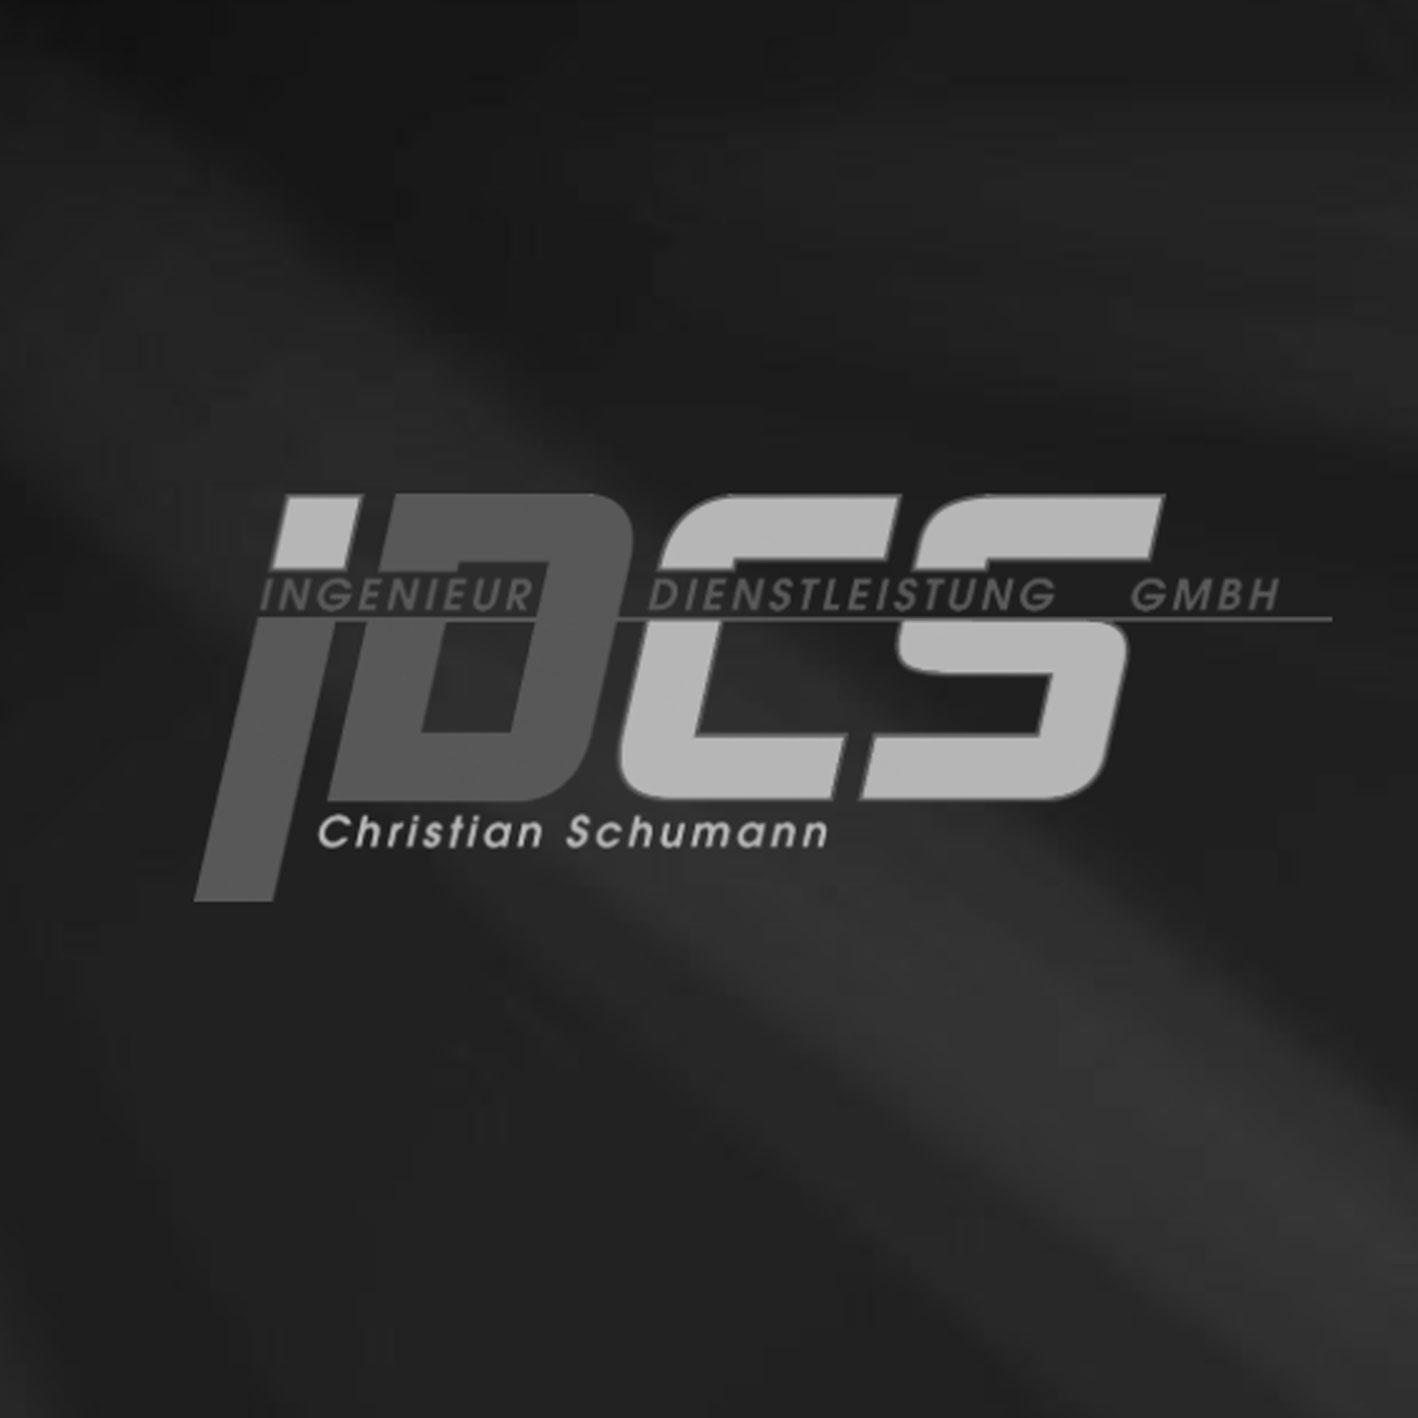 IDCS GmbH